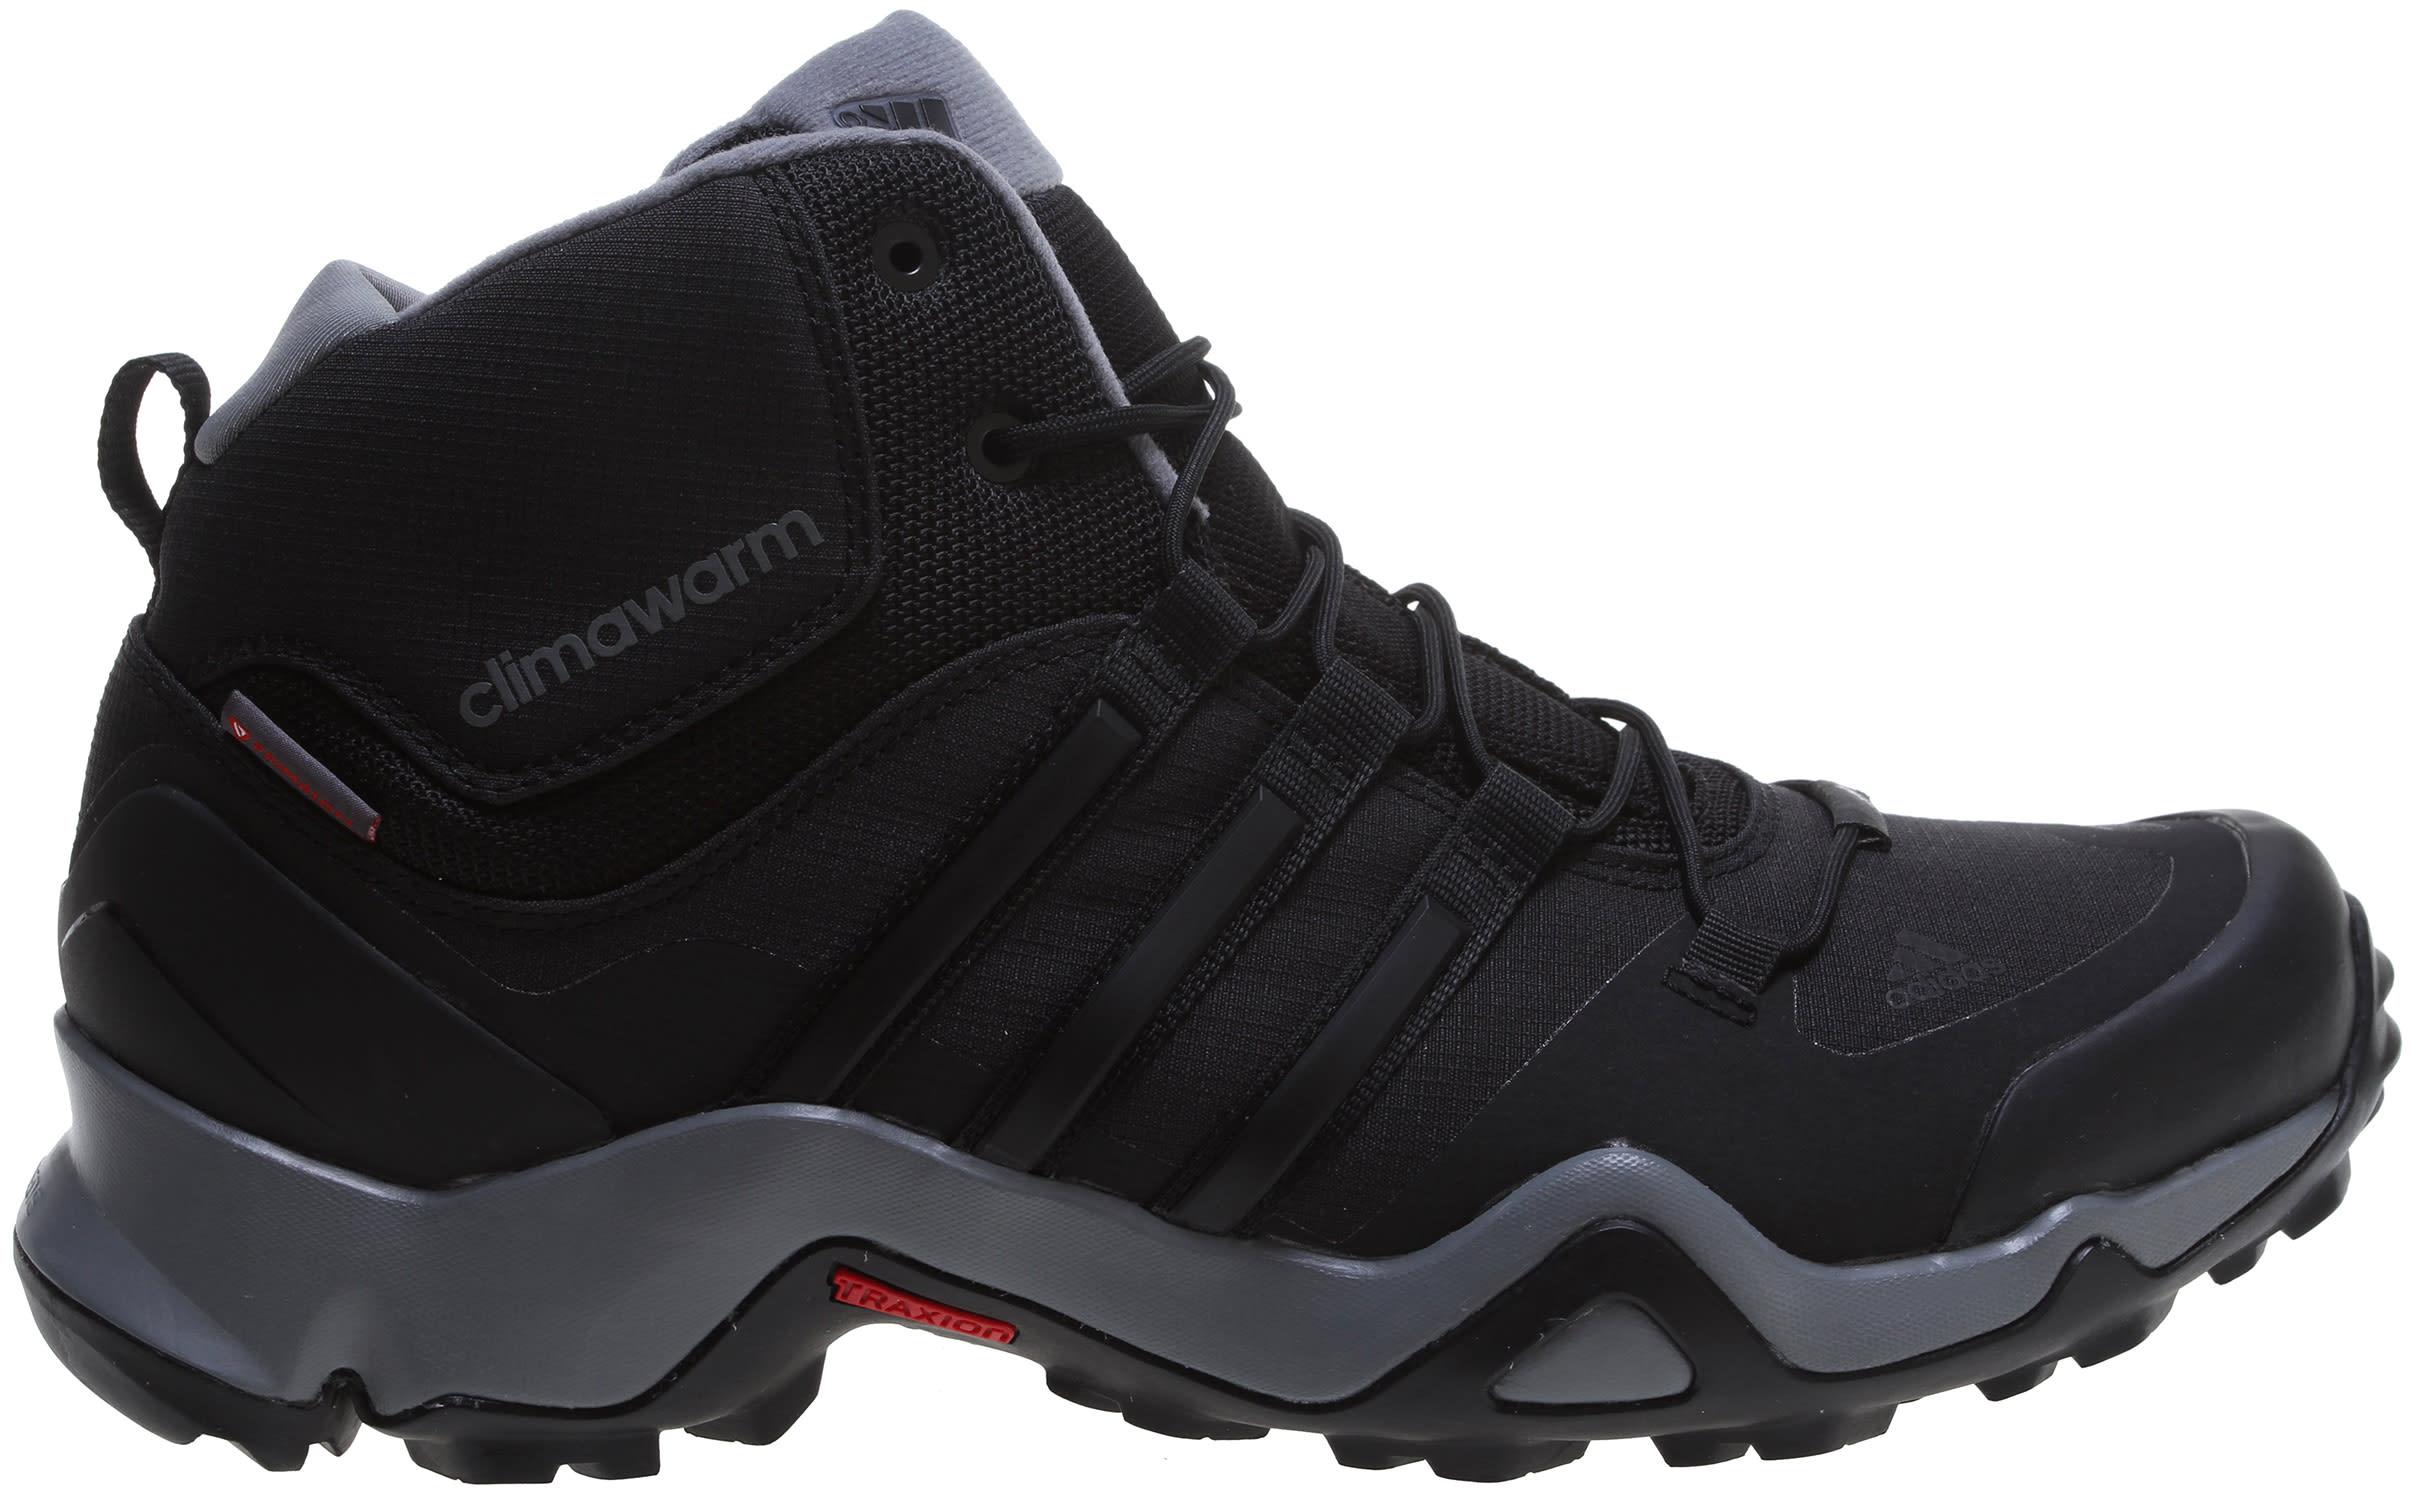 e46e1099bc85 adidas terrex swift mid cw hiking boots adidas hiking boots swift at Adidas  Hiking Boots Swift · adidas outdoor men s terrex swift r2 gtx hiking shoes  ...